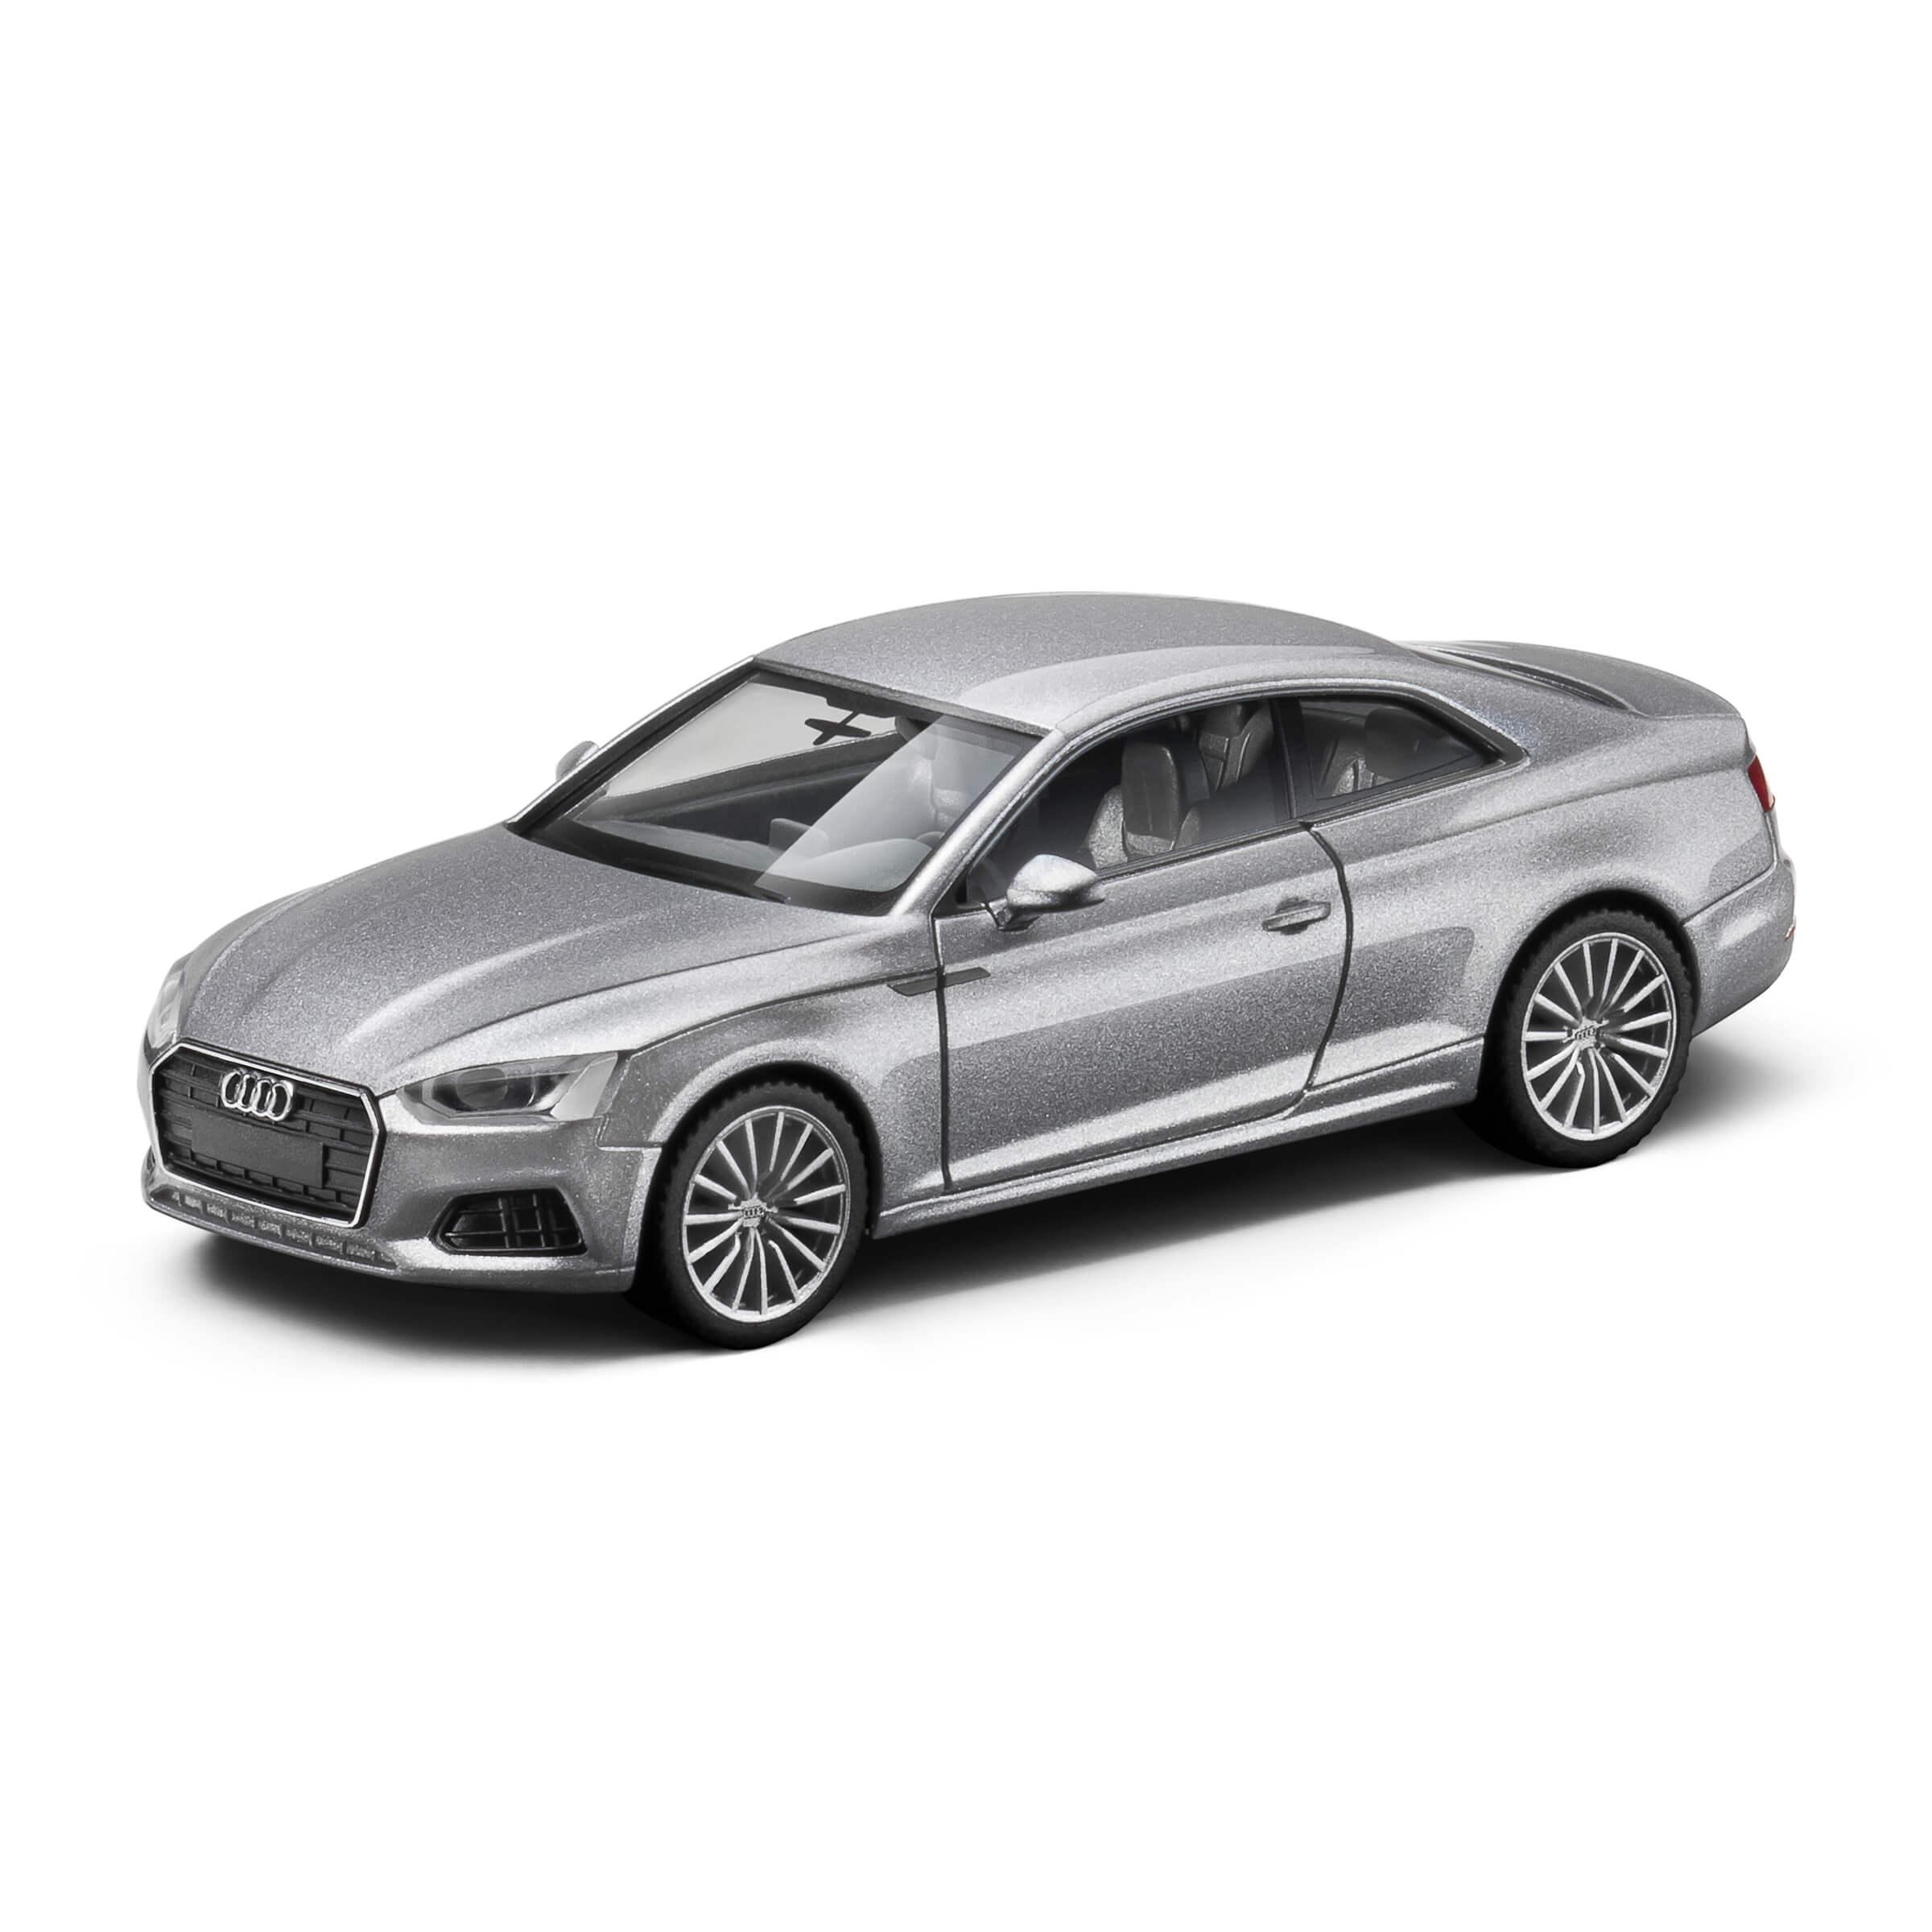 Audi A5 Coupé Florettsilber Modellauto 1:87